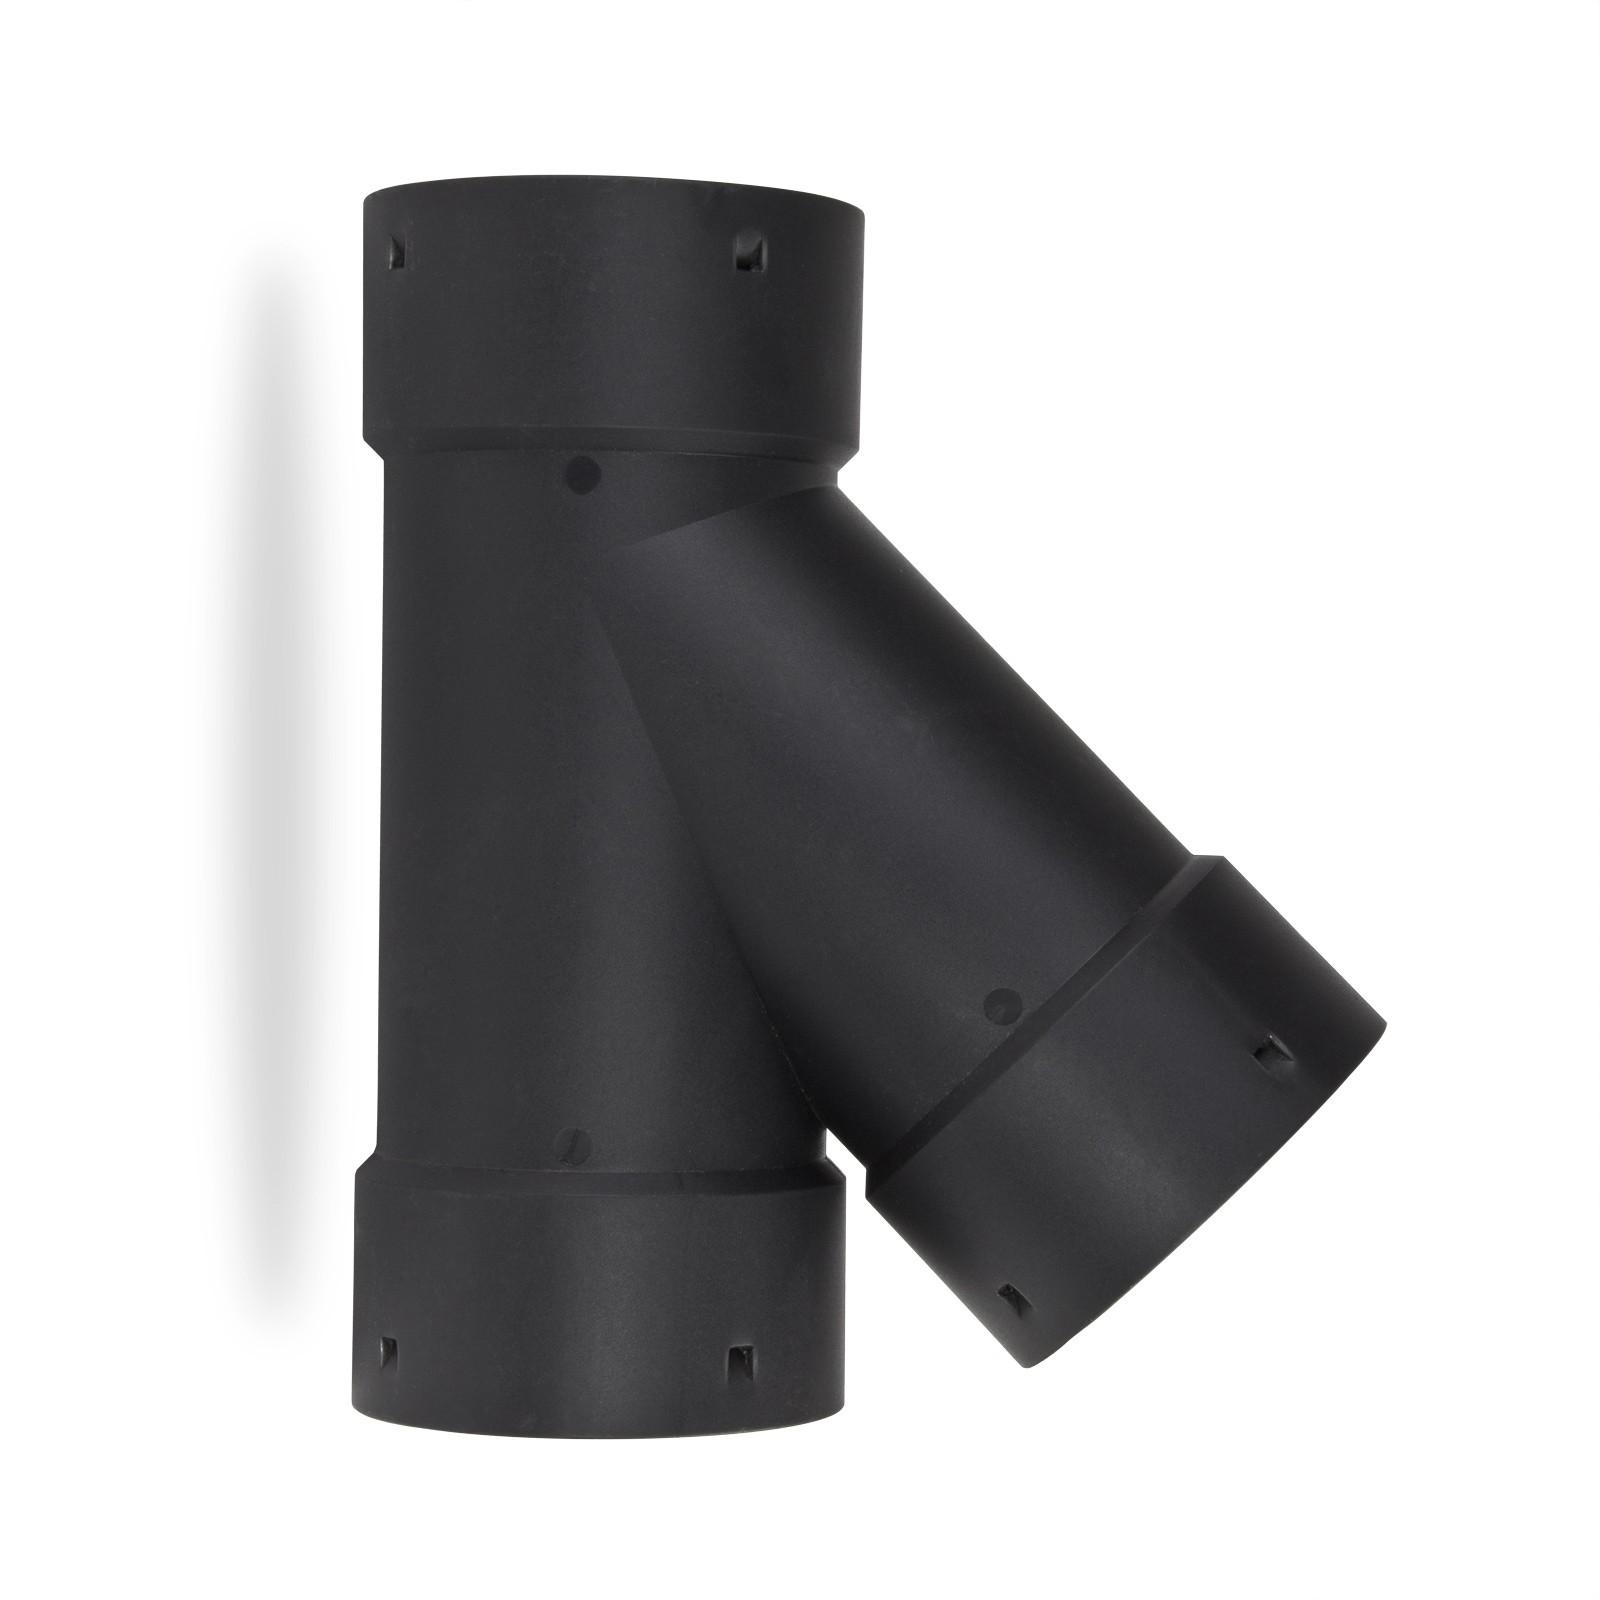 drainagerohr abzweig 45 grad dn100 drainageschlauch drainage. Black Bedroom Furniture Sets. Home Design Ideas